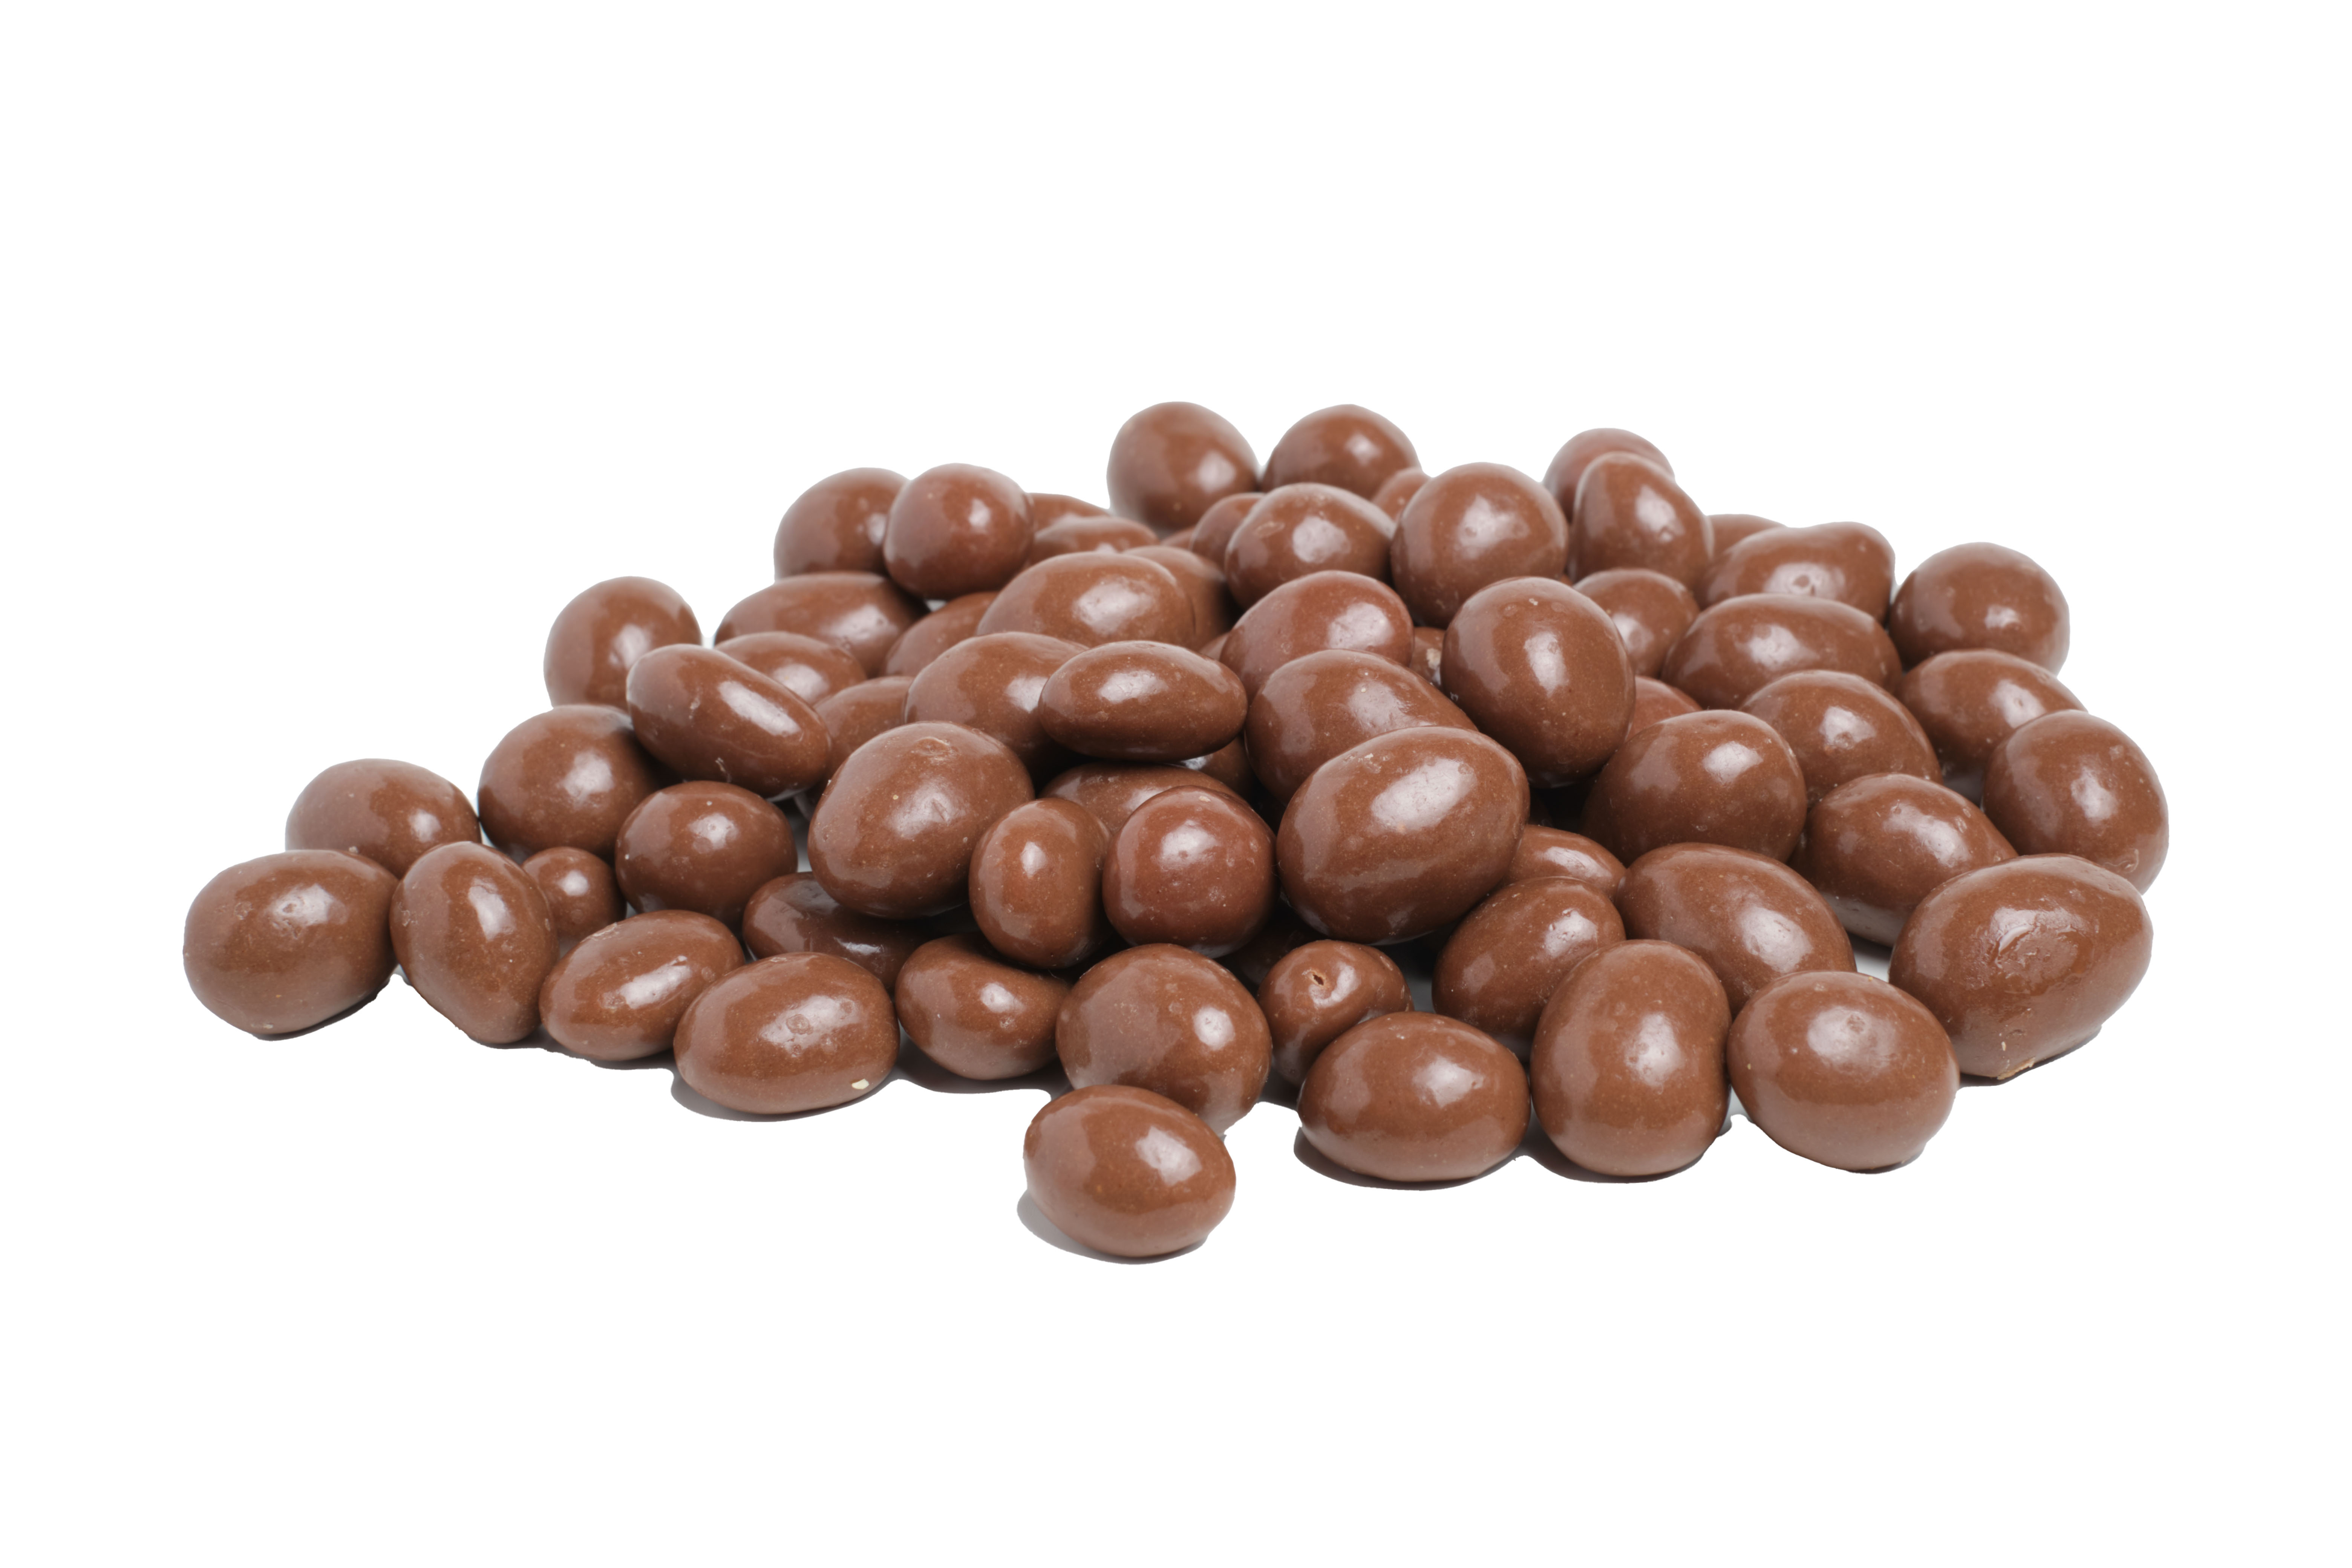 pile-chocolate-coated-peanuts